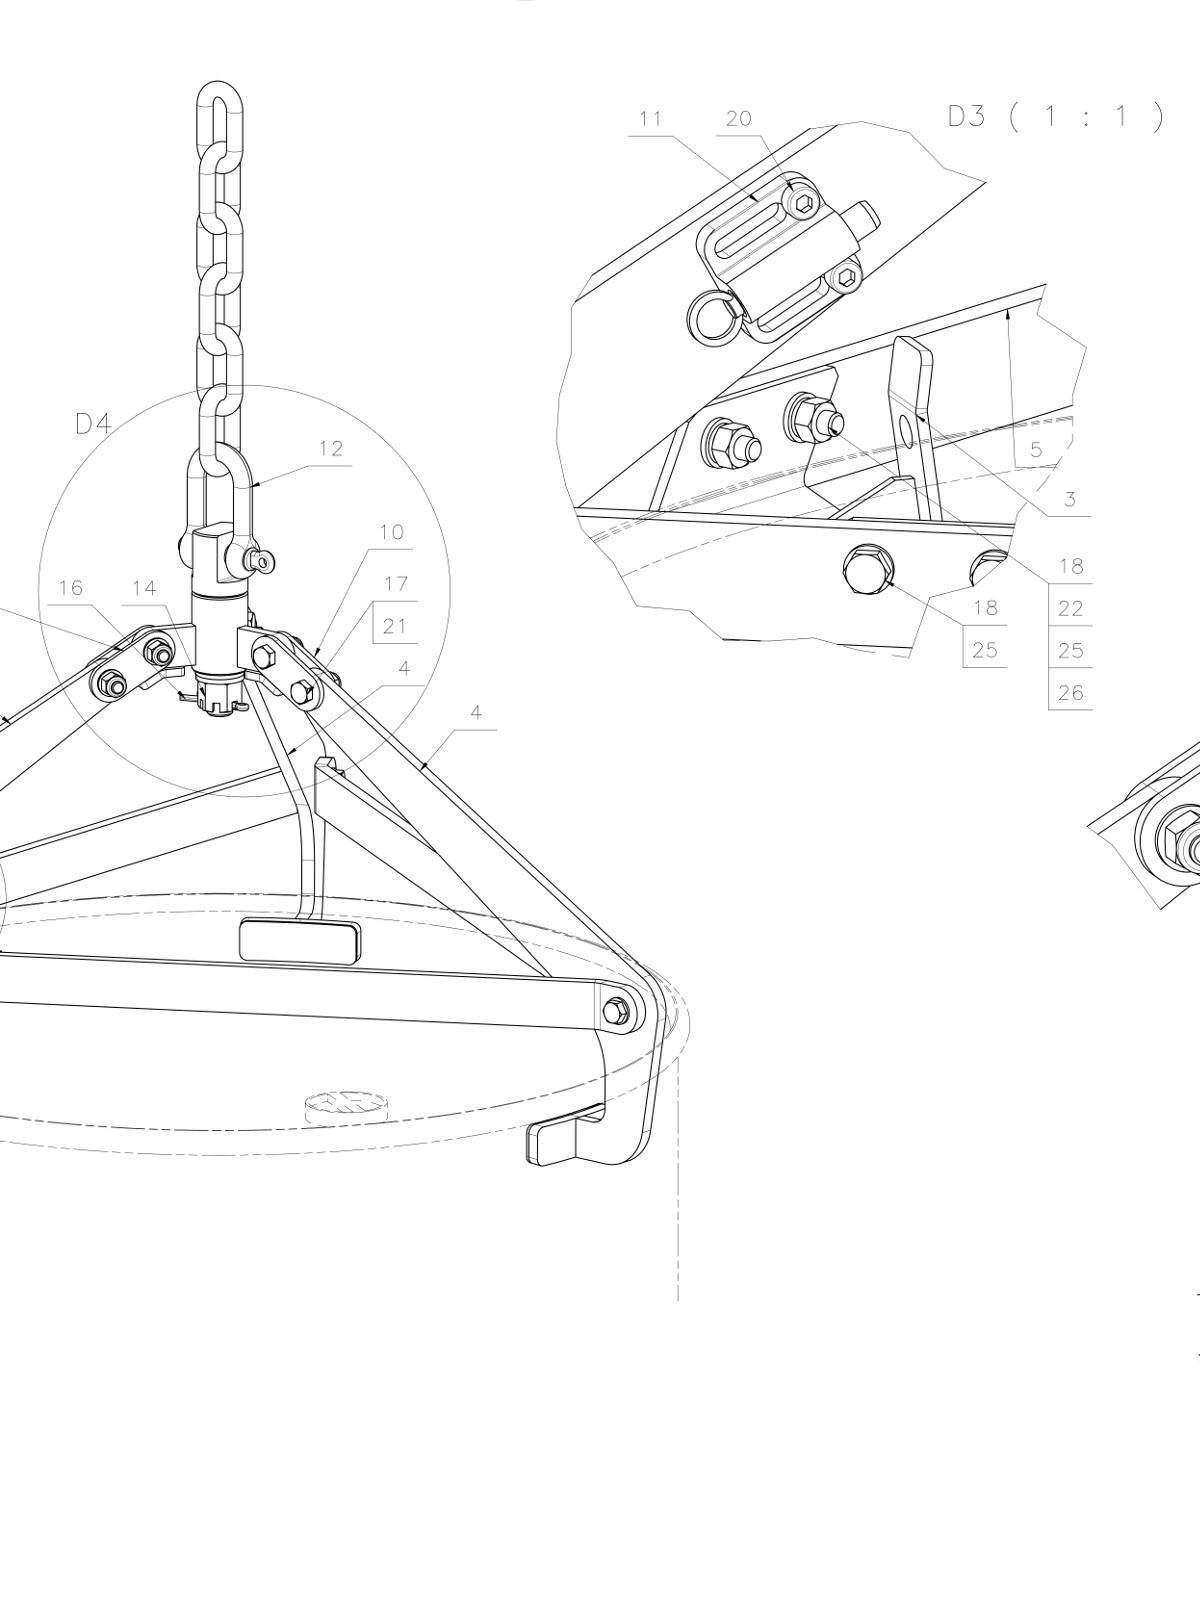 Volume Doser 1 5[dm3] (INOX) - Semi-automatic - 3D Inventor Project